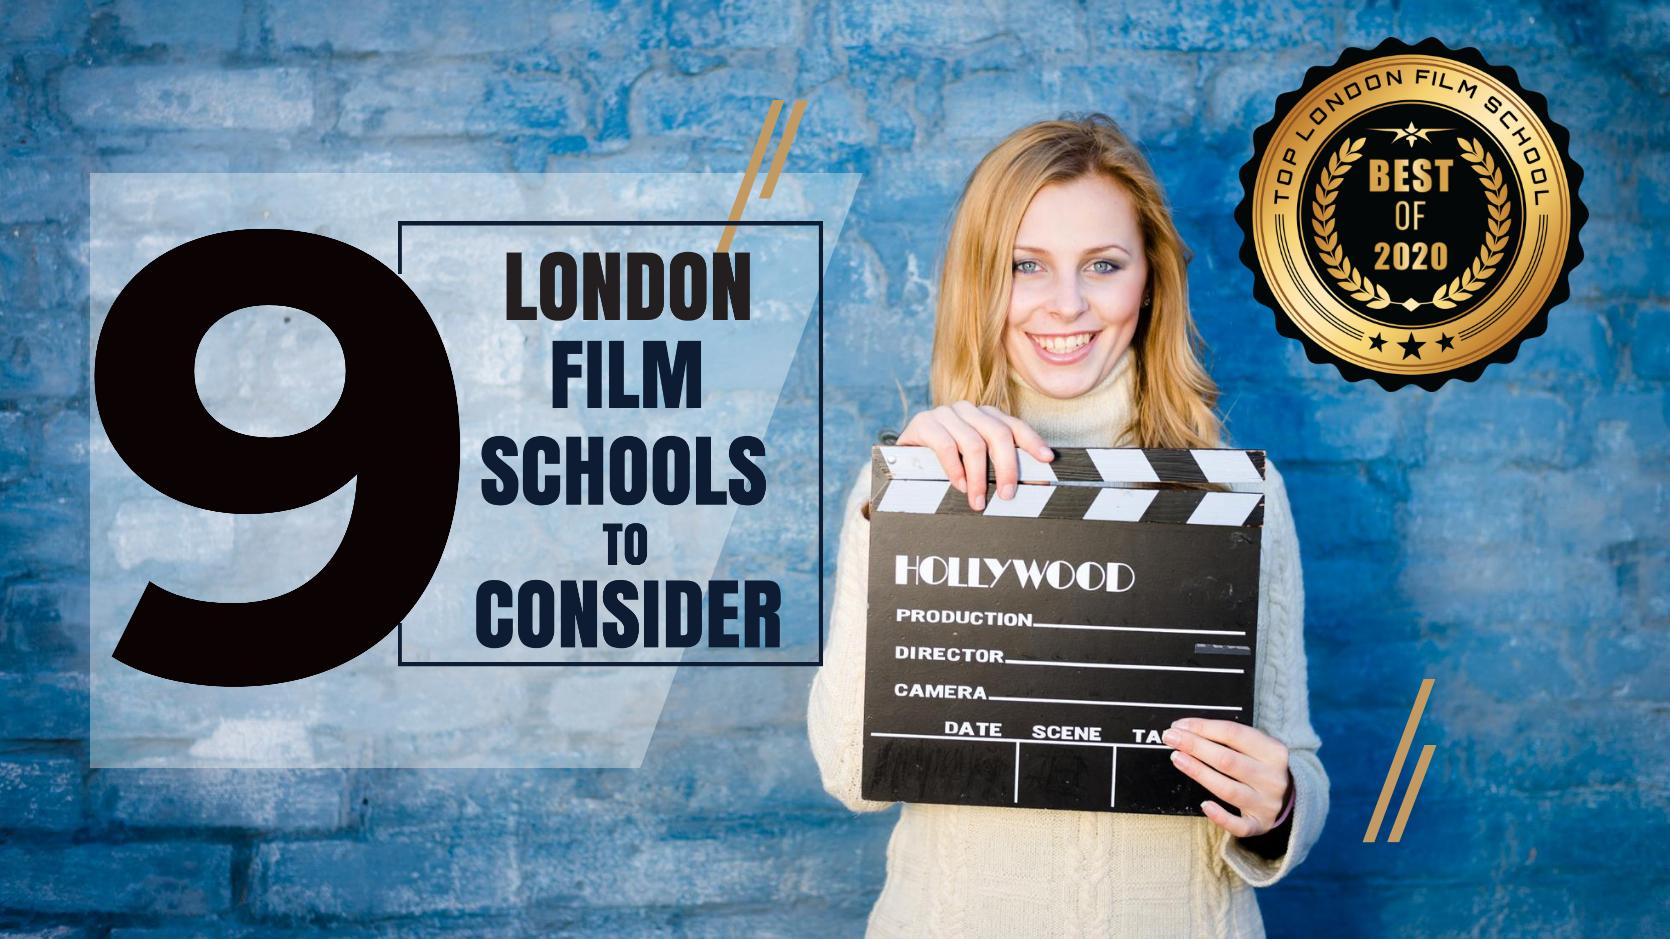 Top 9 London Film Schools